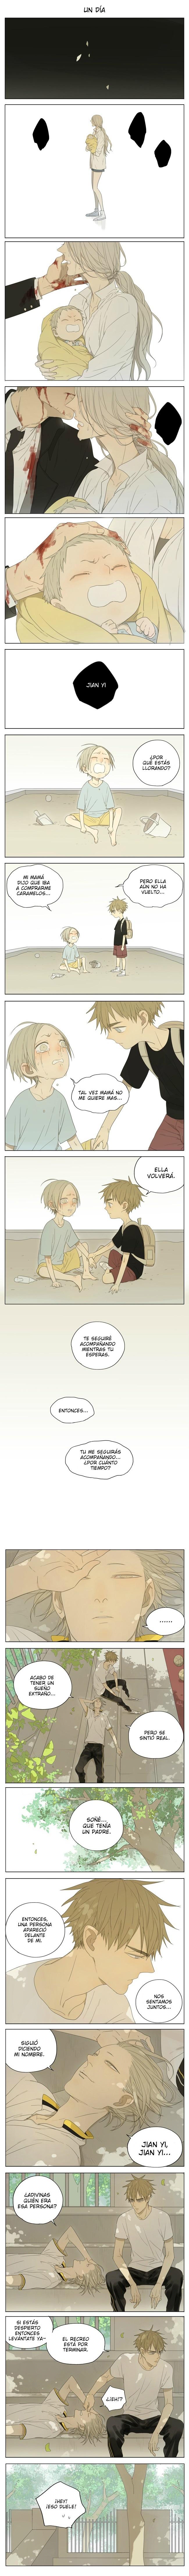 http://c5.ninemanga.com/es_manga/7/15943/392075/1514f187930072575629709336826443.jpg Page 6